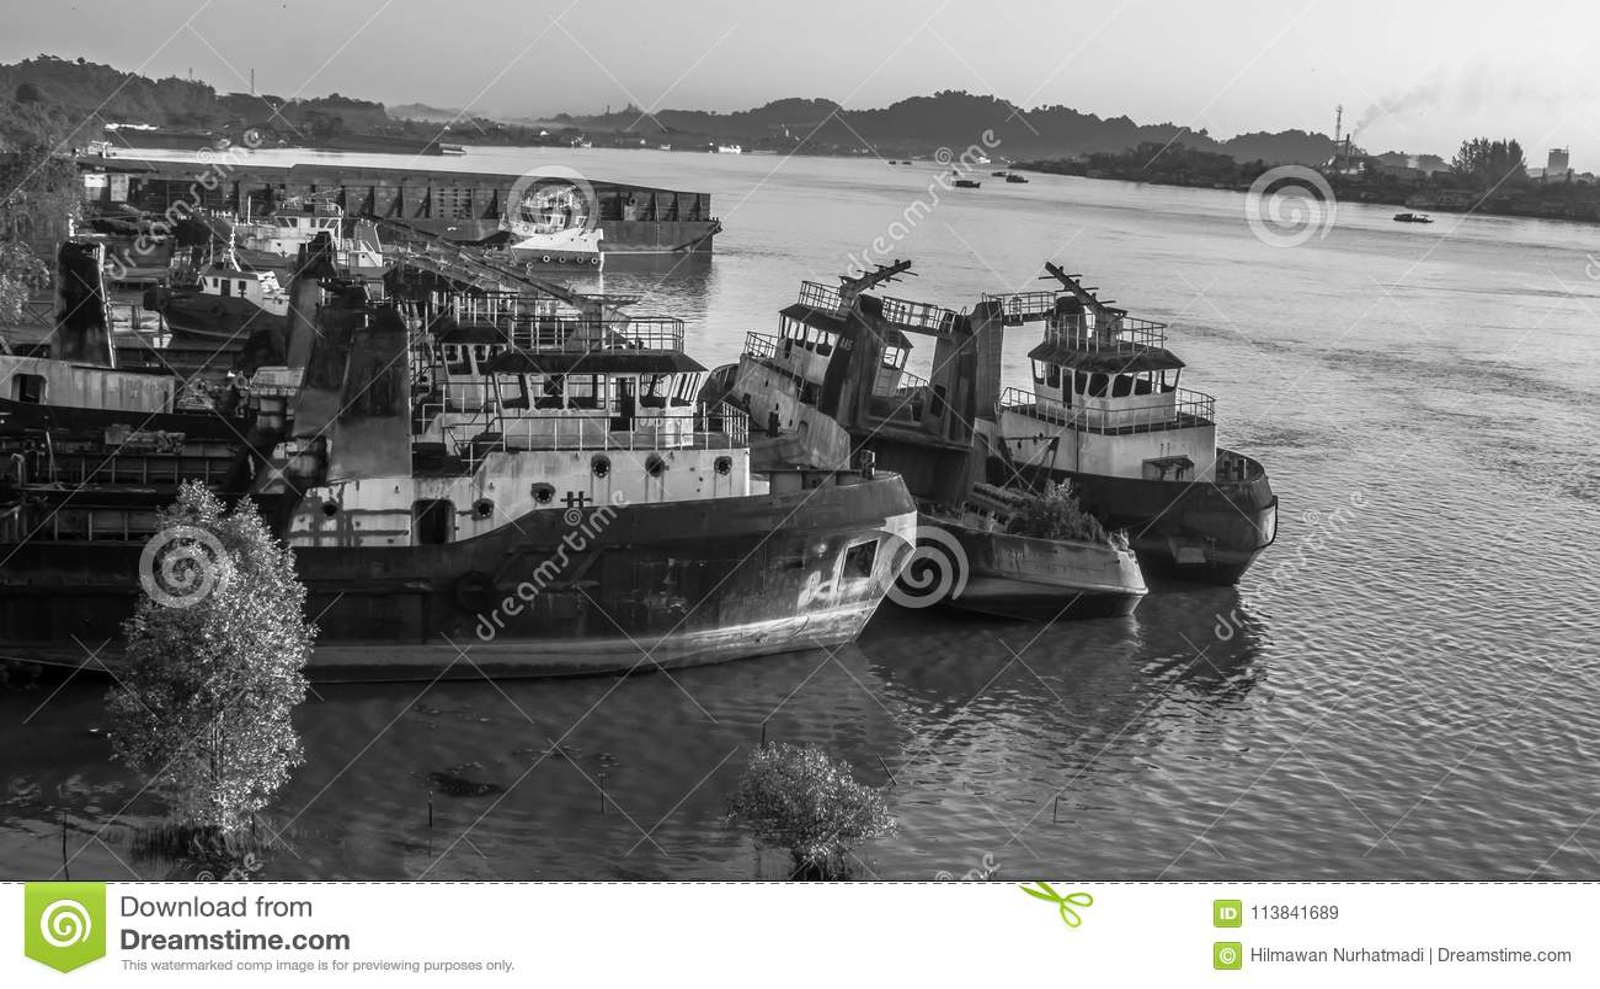 Shipping yard on Mahakam riverbank, Borneo, Indonesia black and white